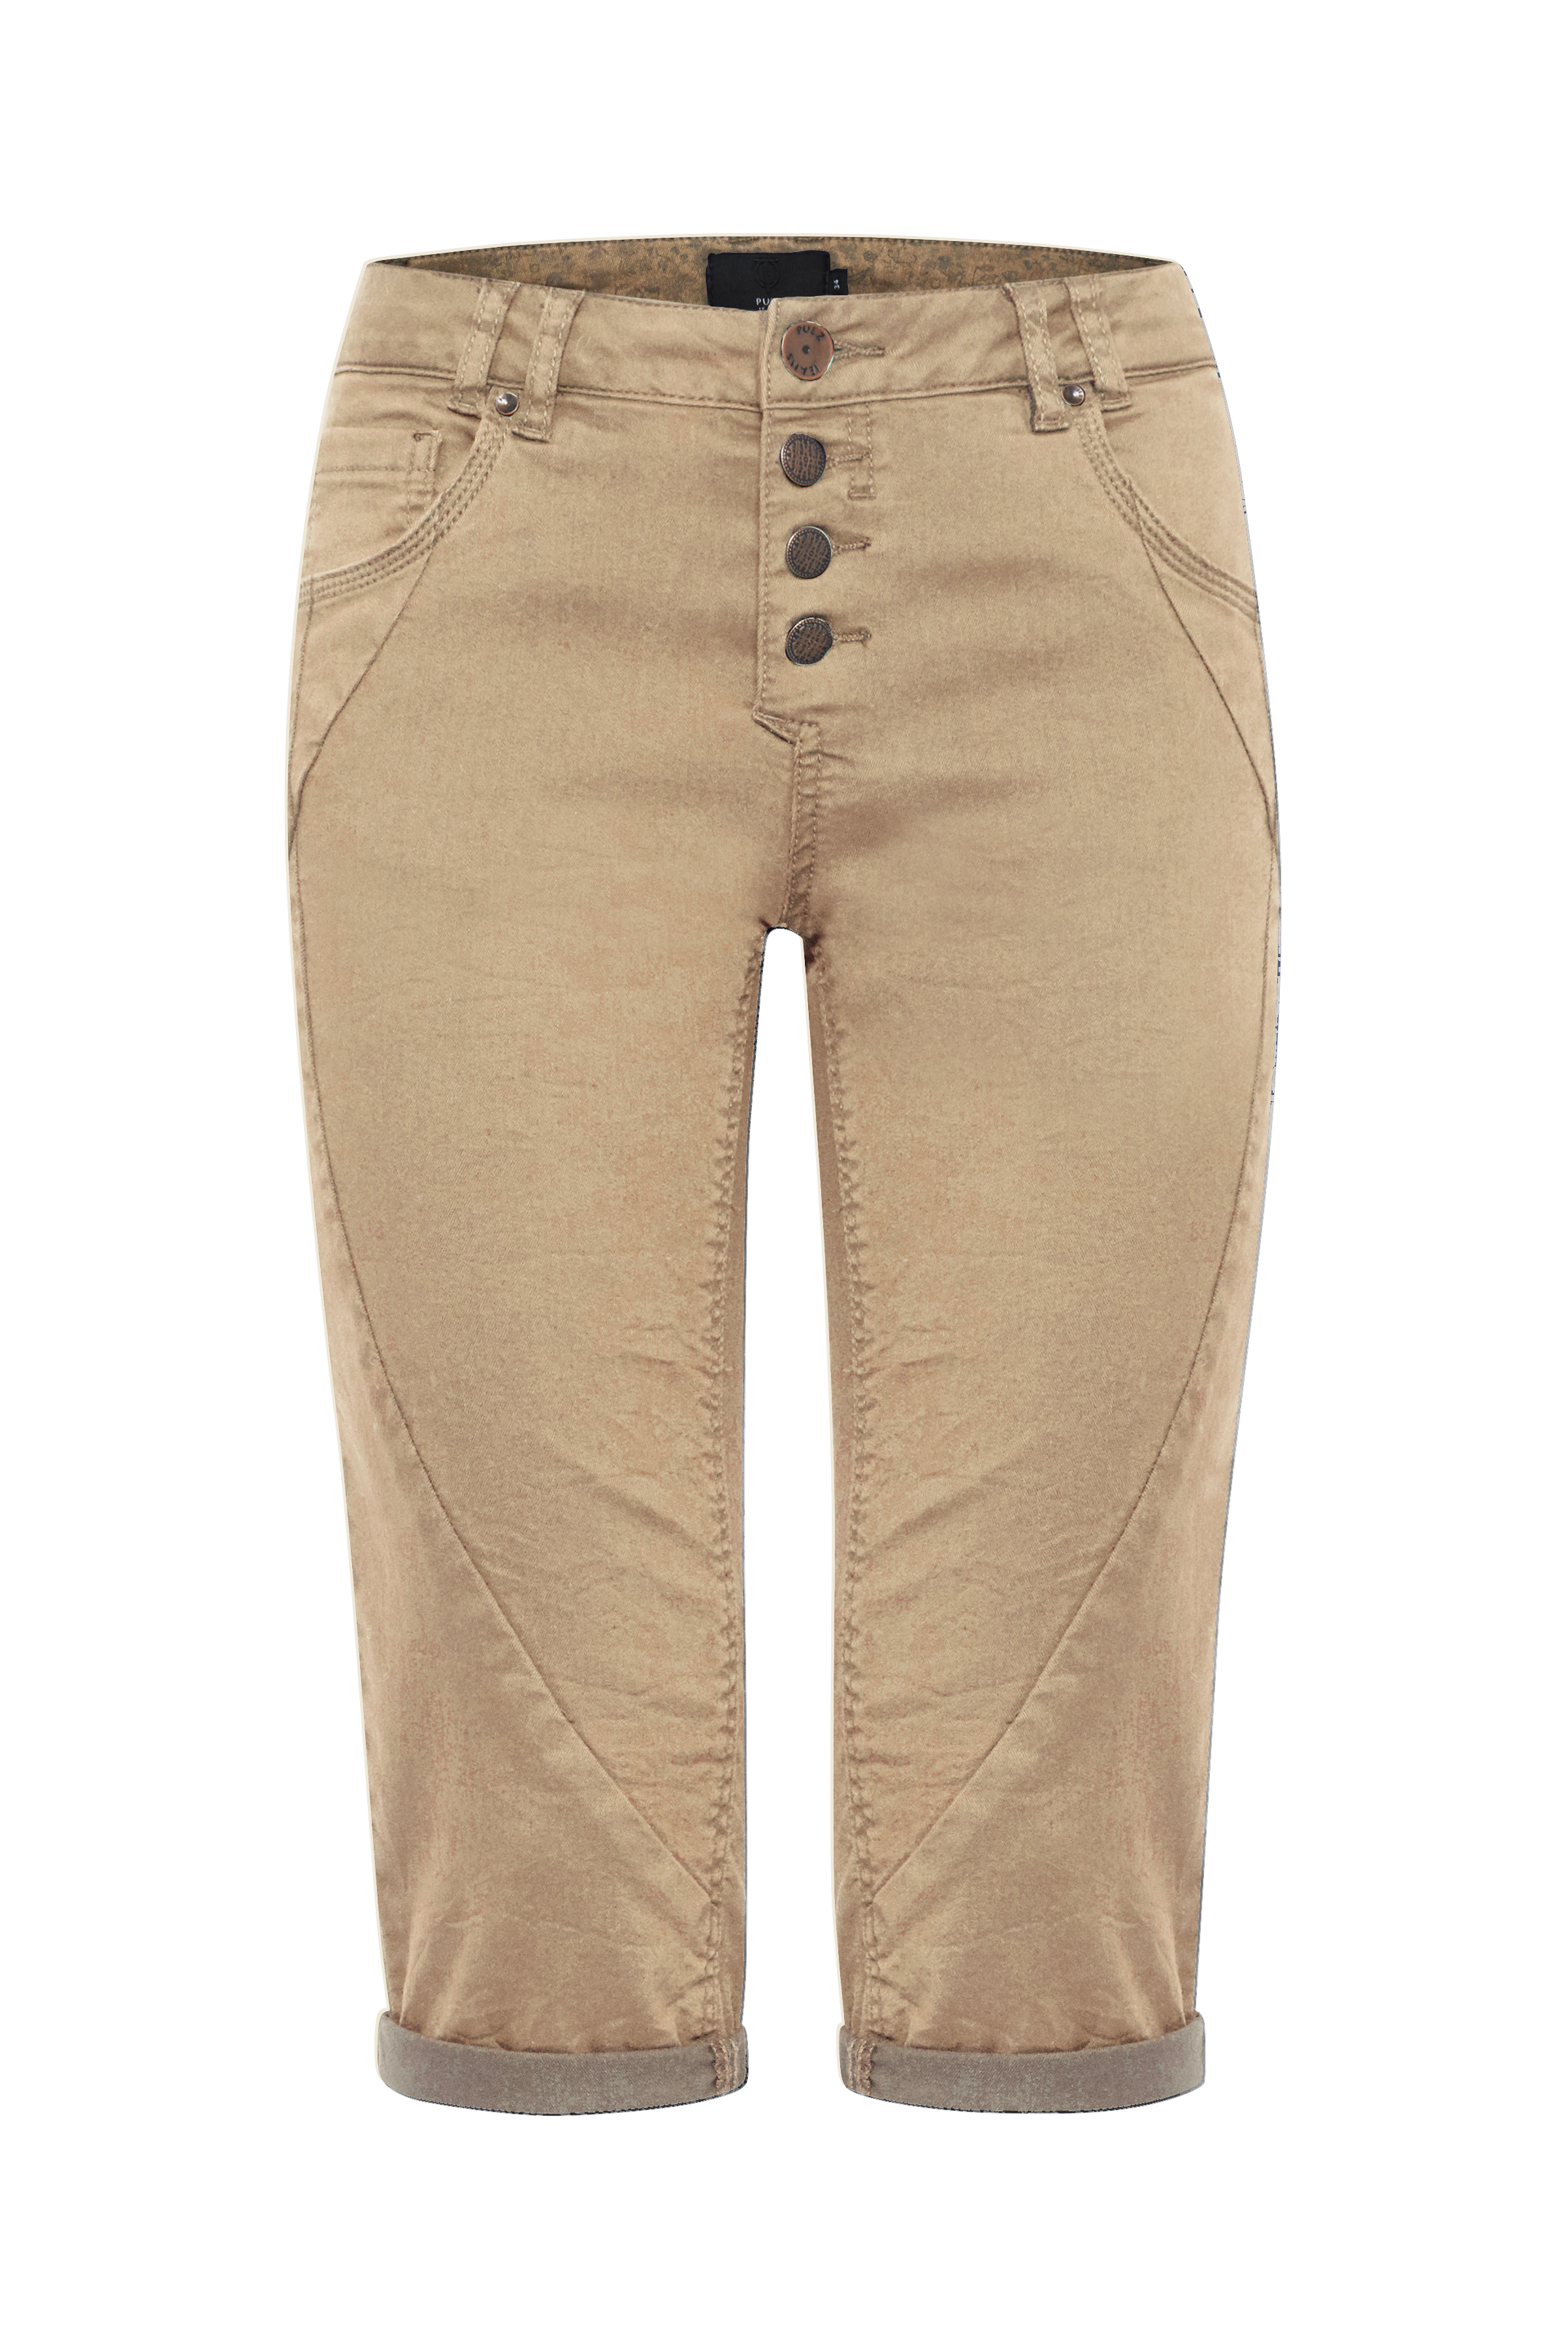 Image of Pulz Jeans Dame Capribukser - Sand